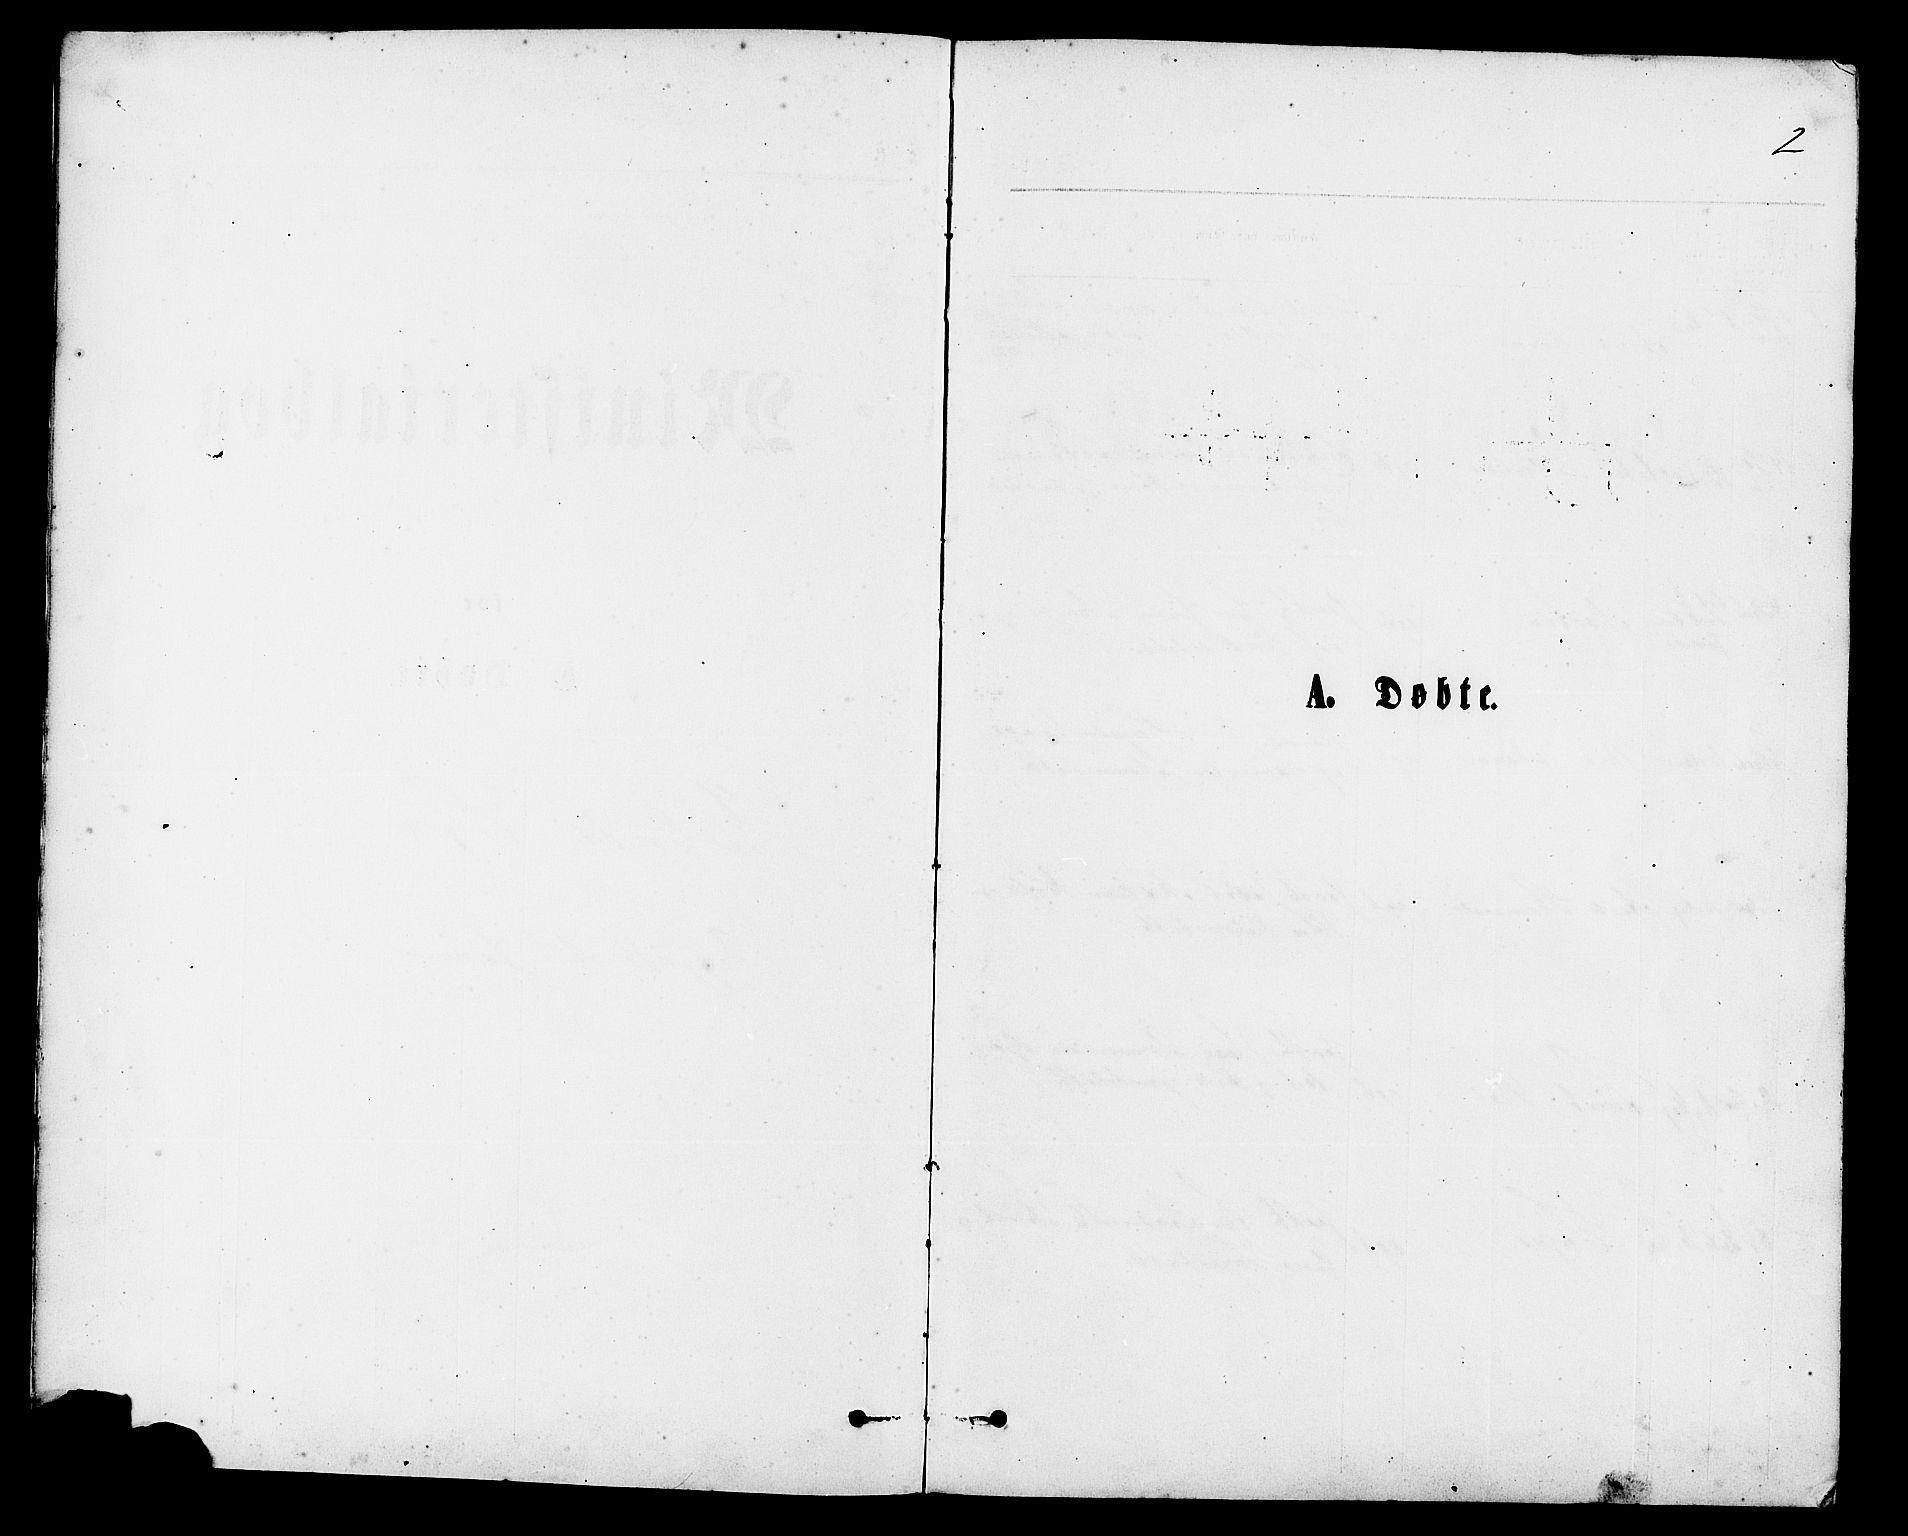 SAST, Vikedal sokneprestkontor, IV: Ministerialbok nr. A 9, 1868-1885, s. 2